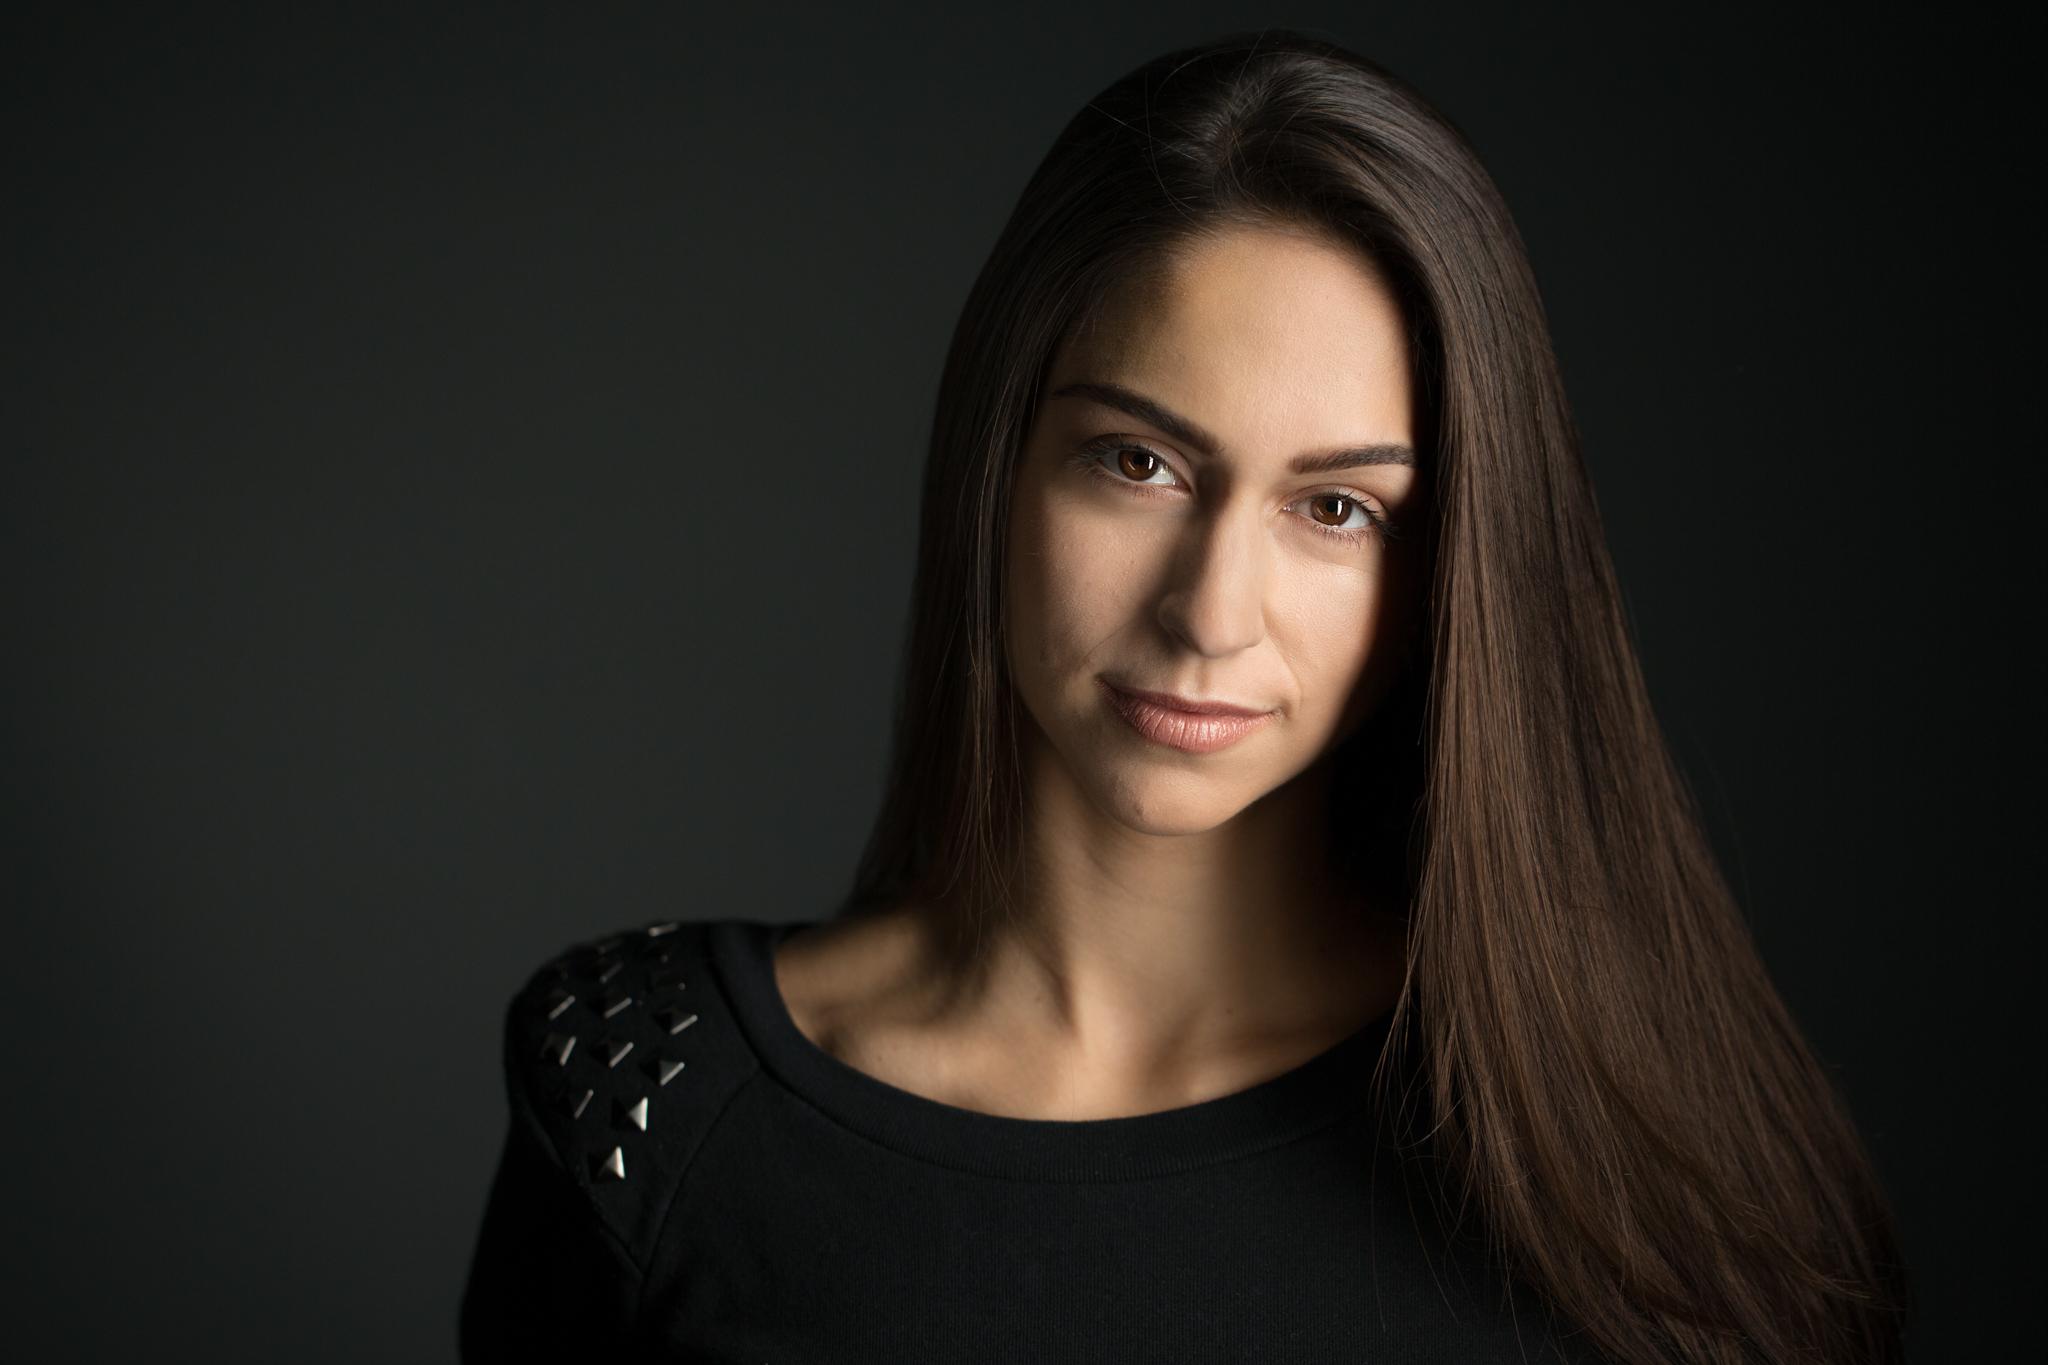 Raquelle Gracie Obrien